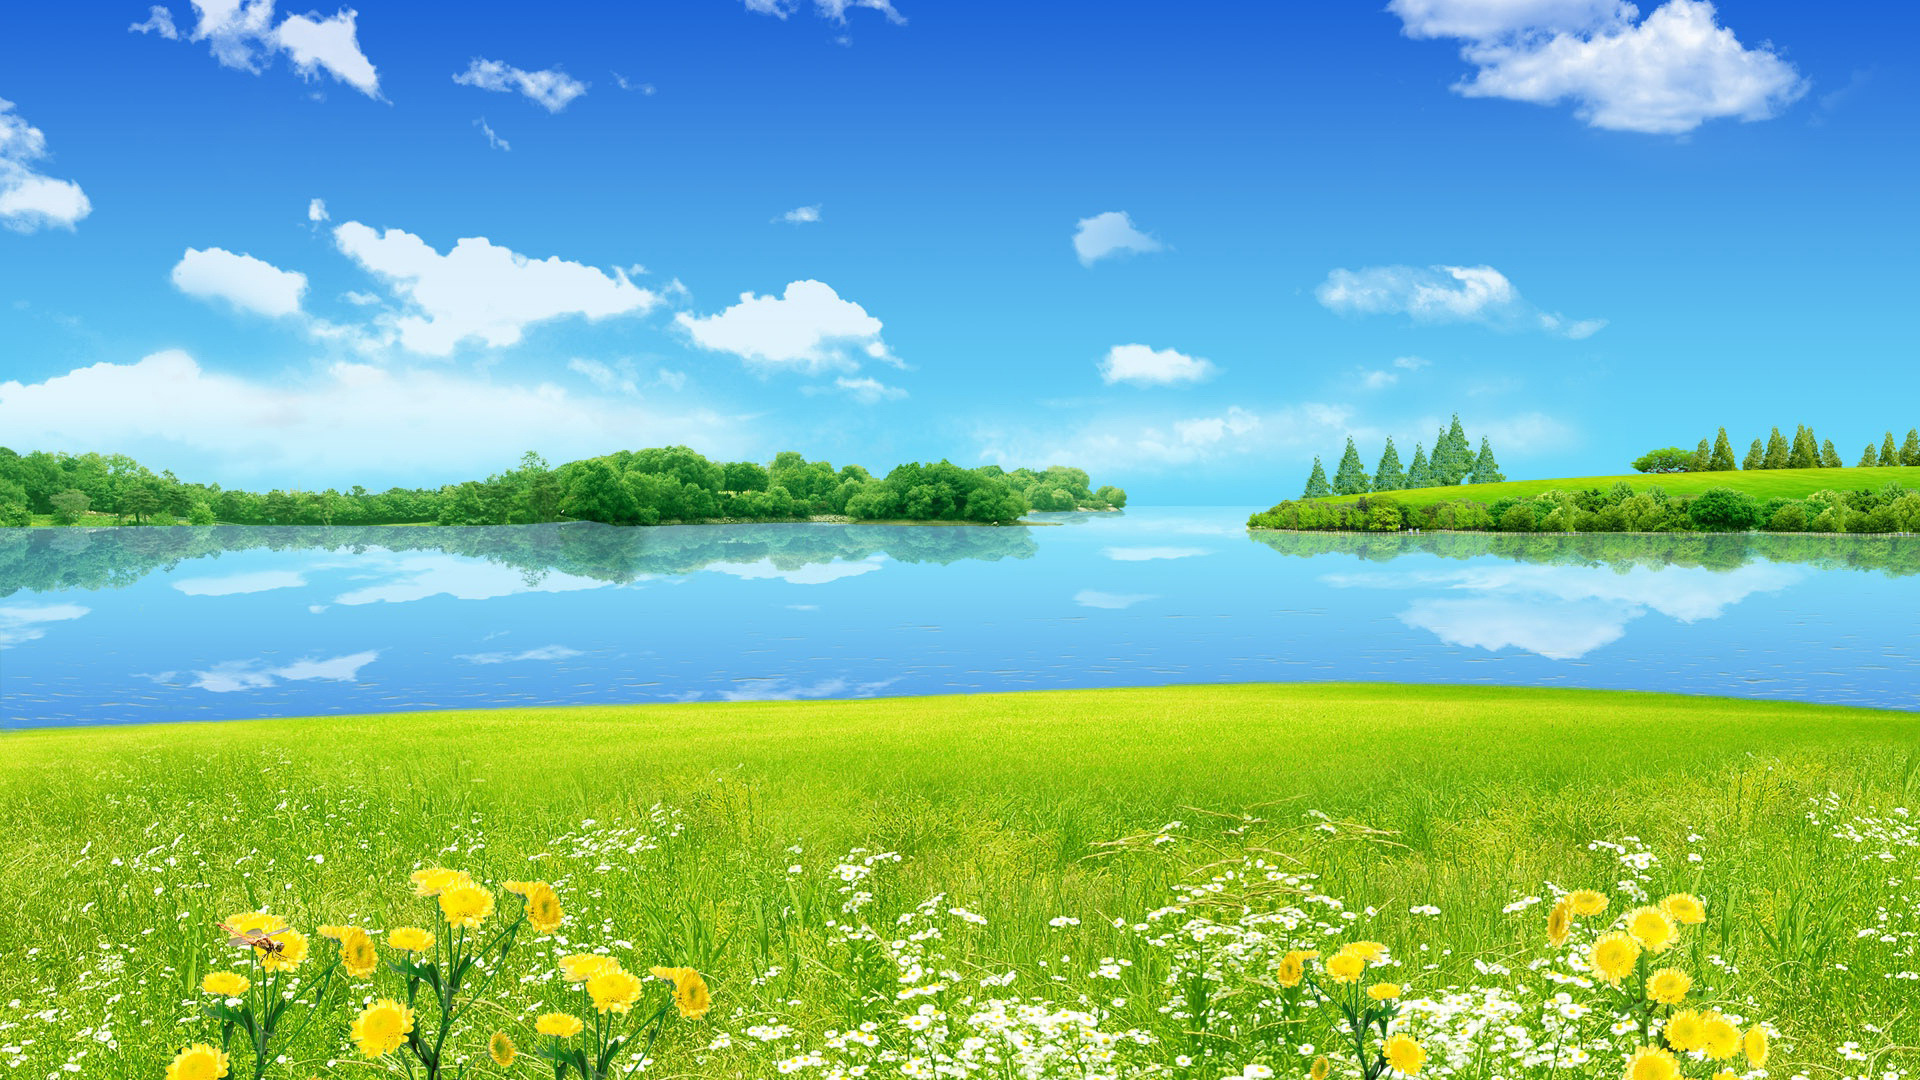 46 sunny wallpaper screensavers on wallpapersafari - Sunny day wallpaper ...